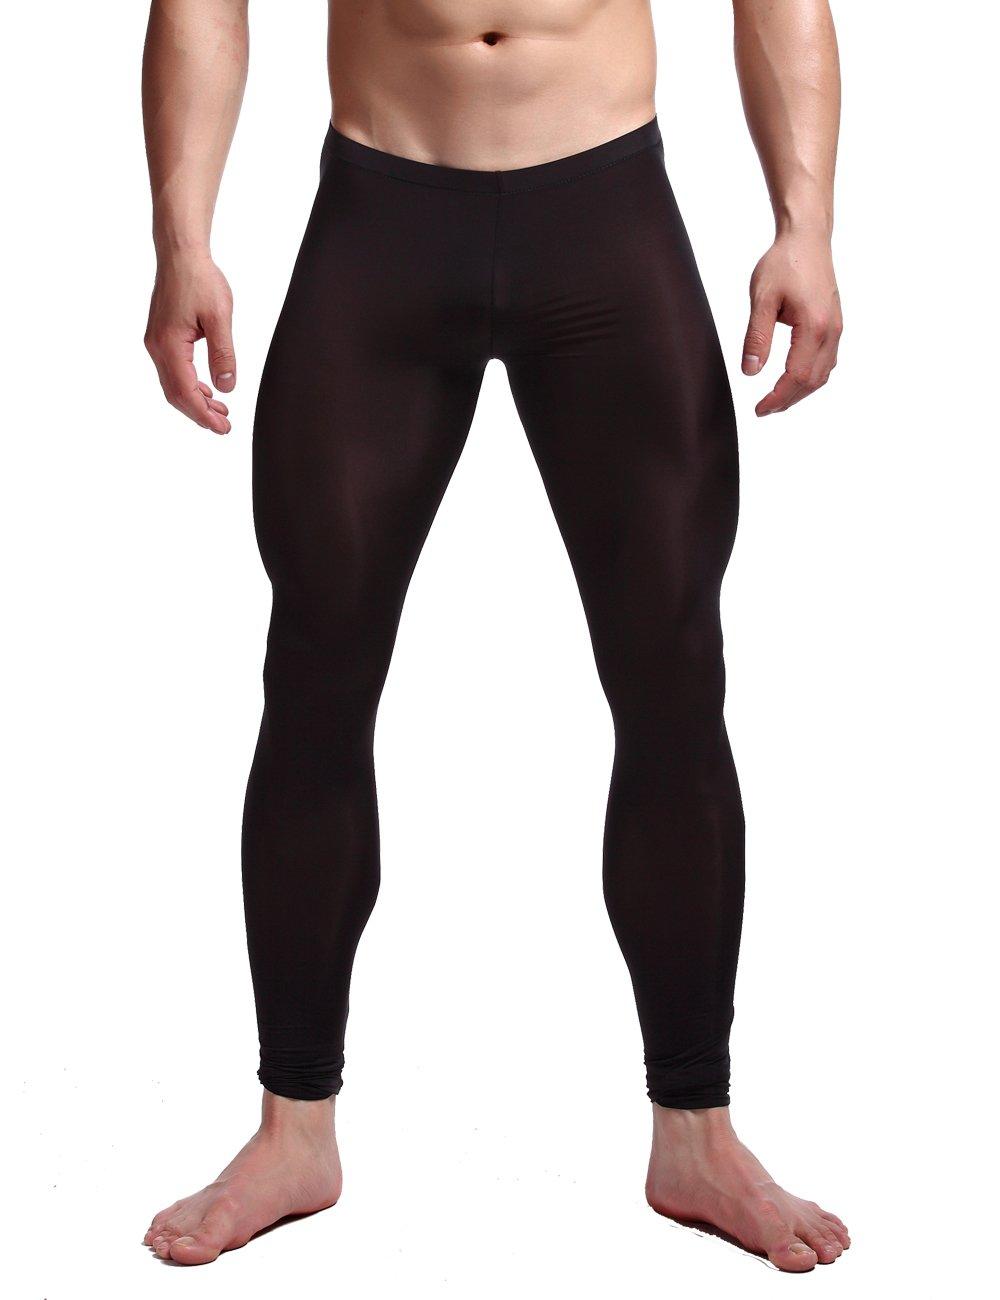 K-Men Men's Soft Mesh Transparent Leggings Long Johns Pants Underpants Black XL